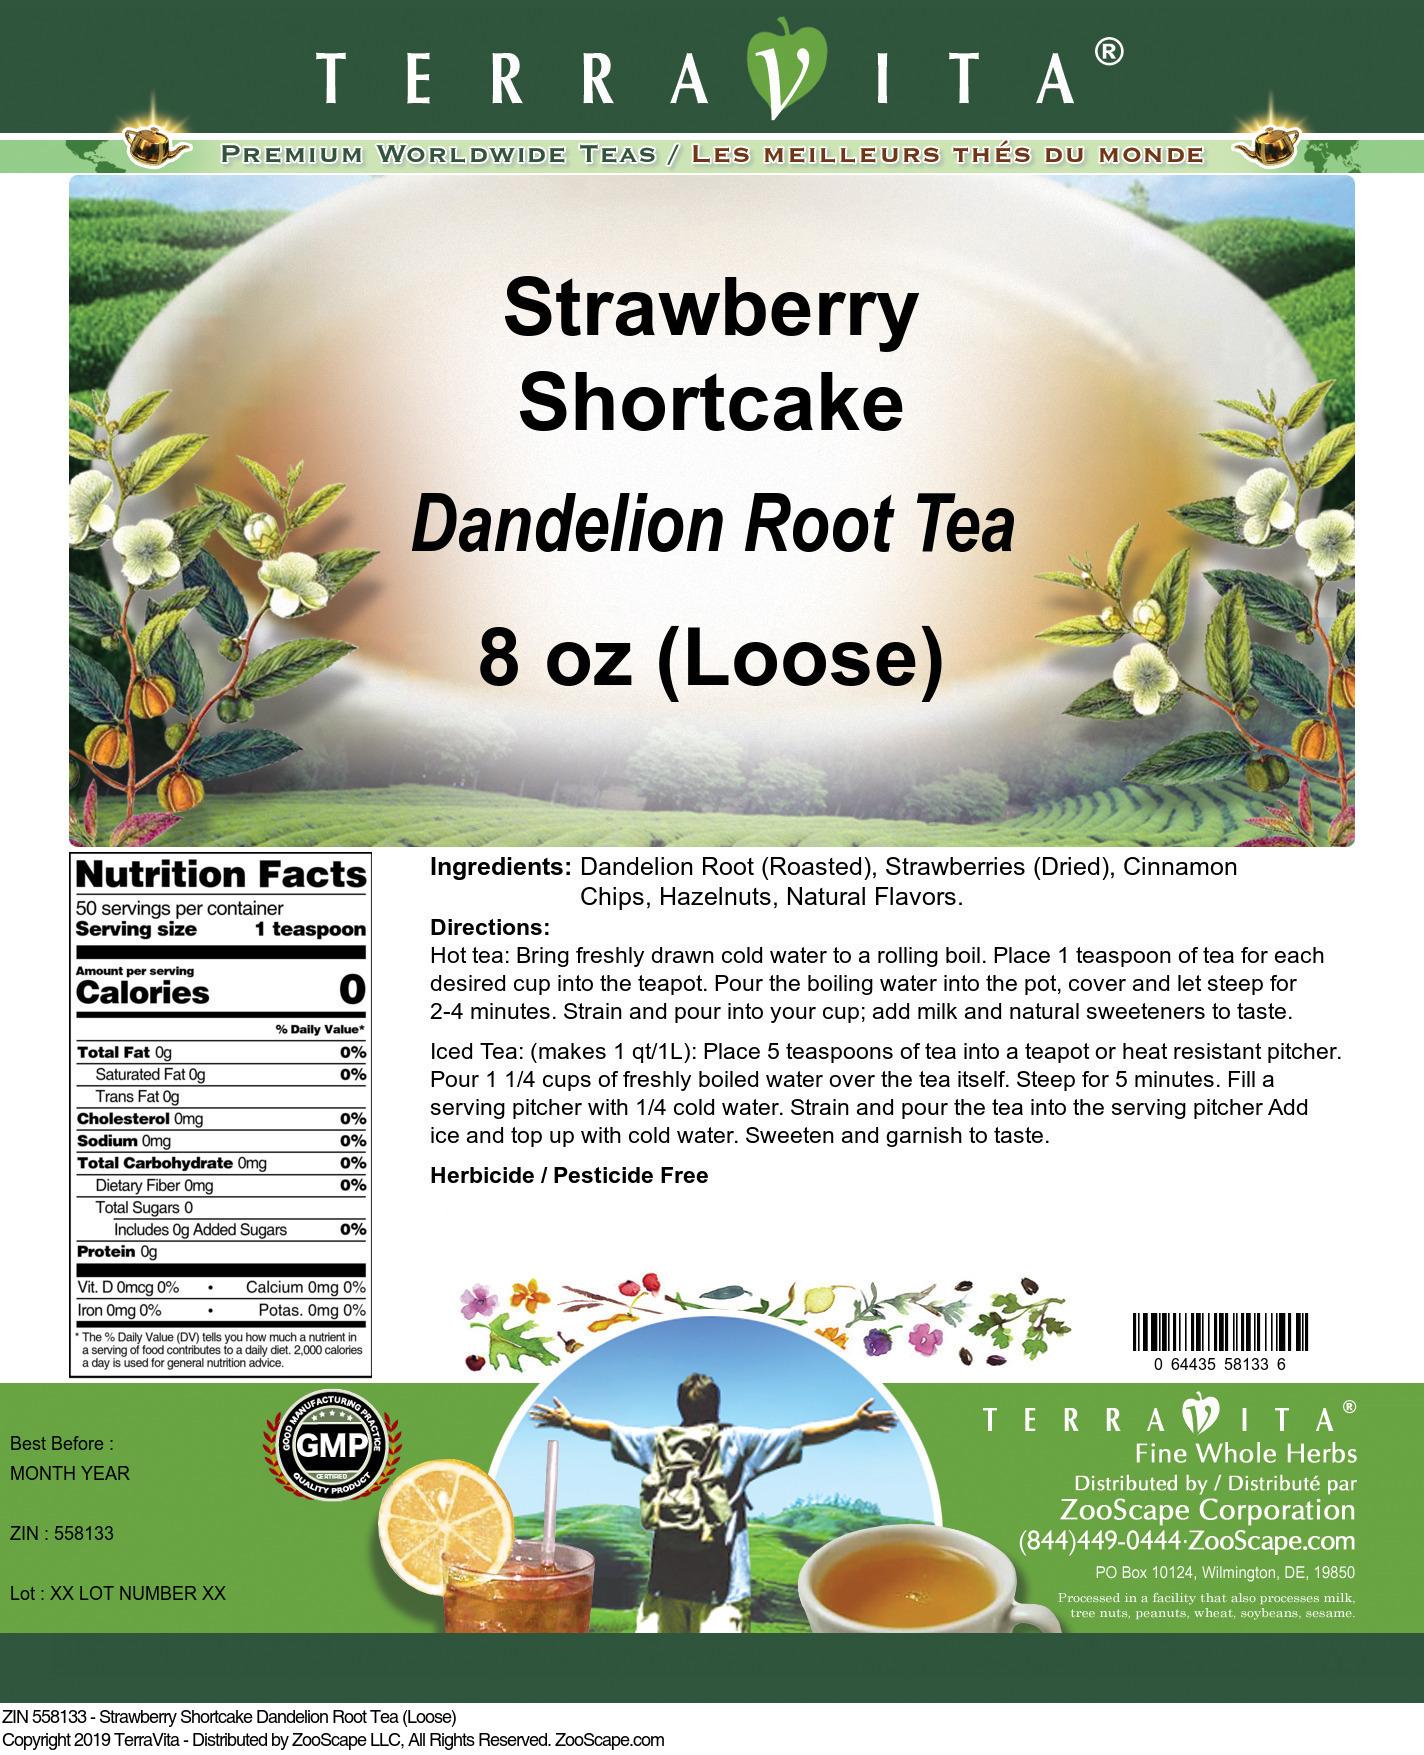 Strawberry Shortcake Dandelion Root